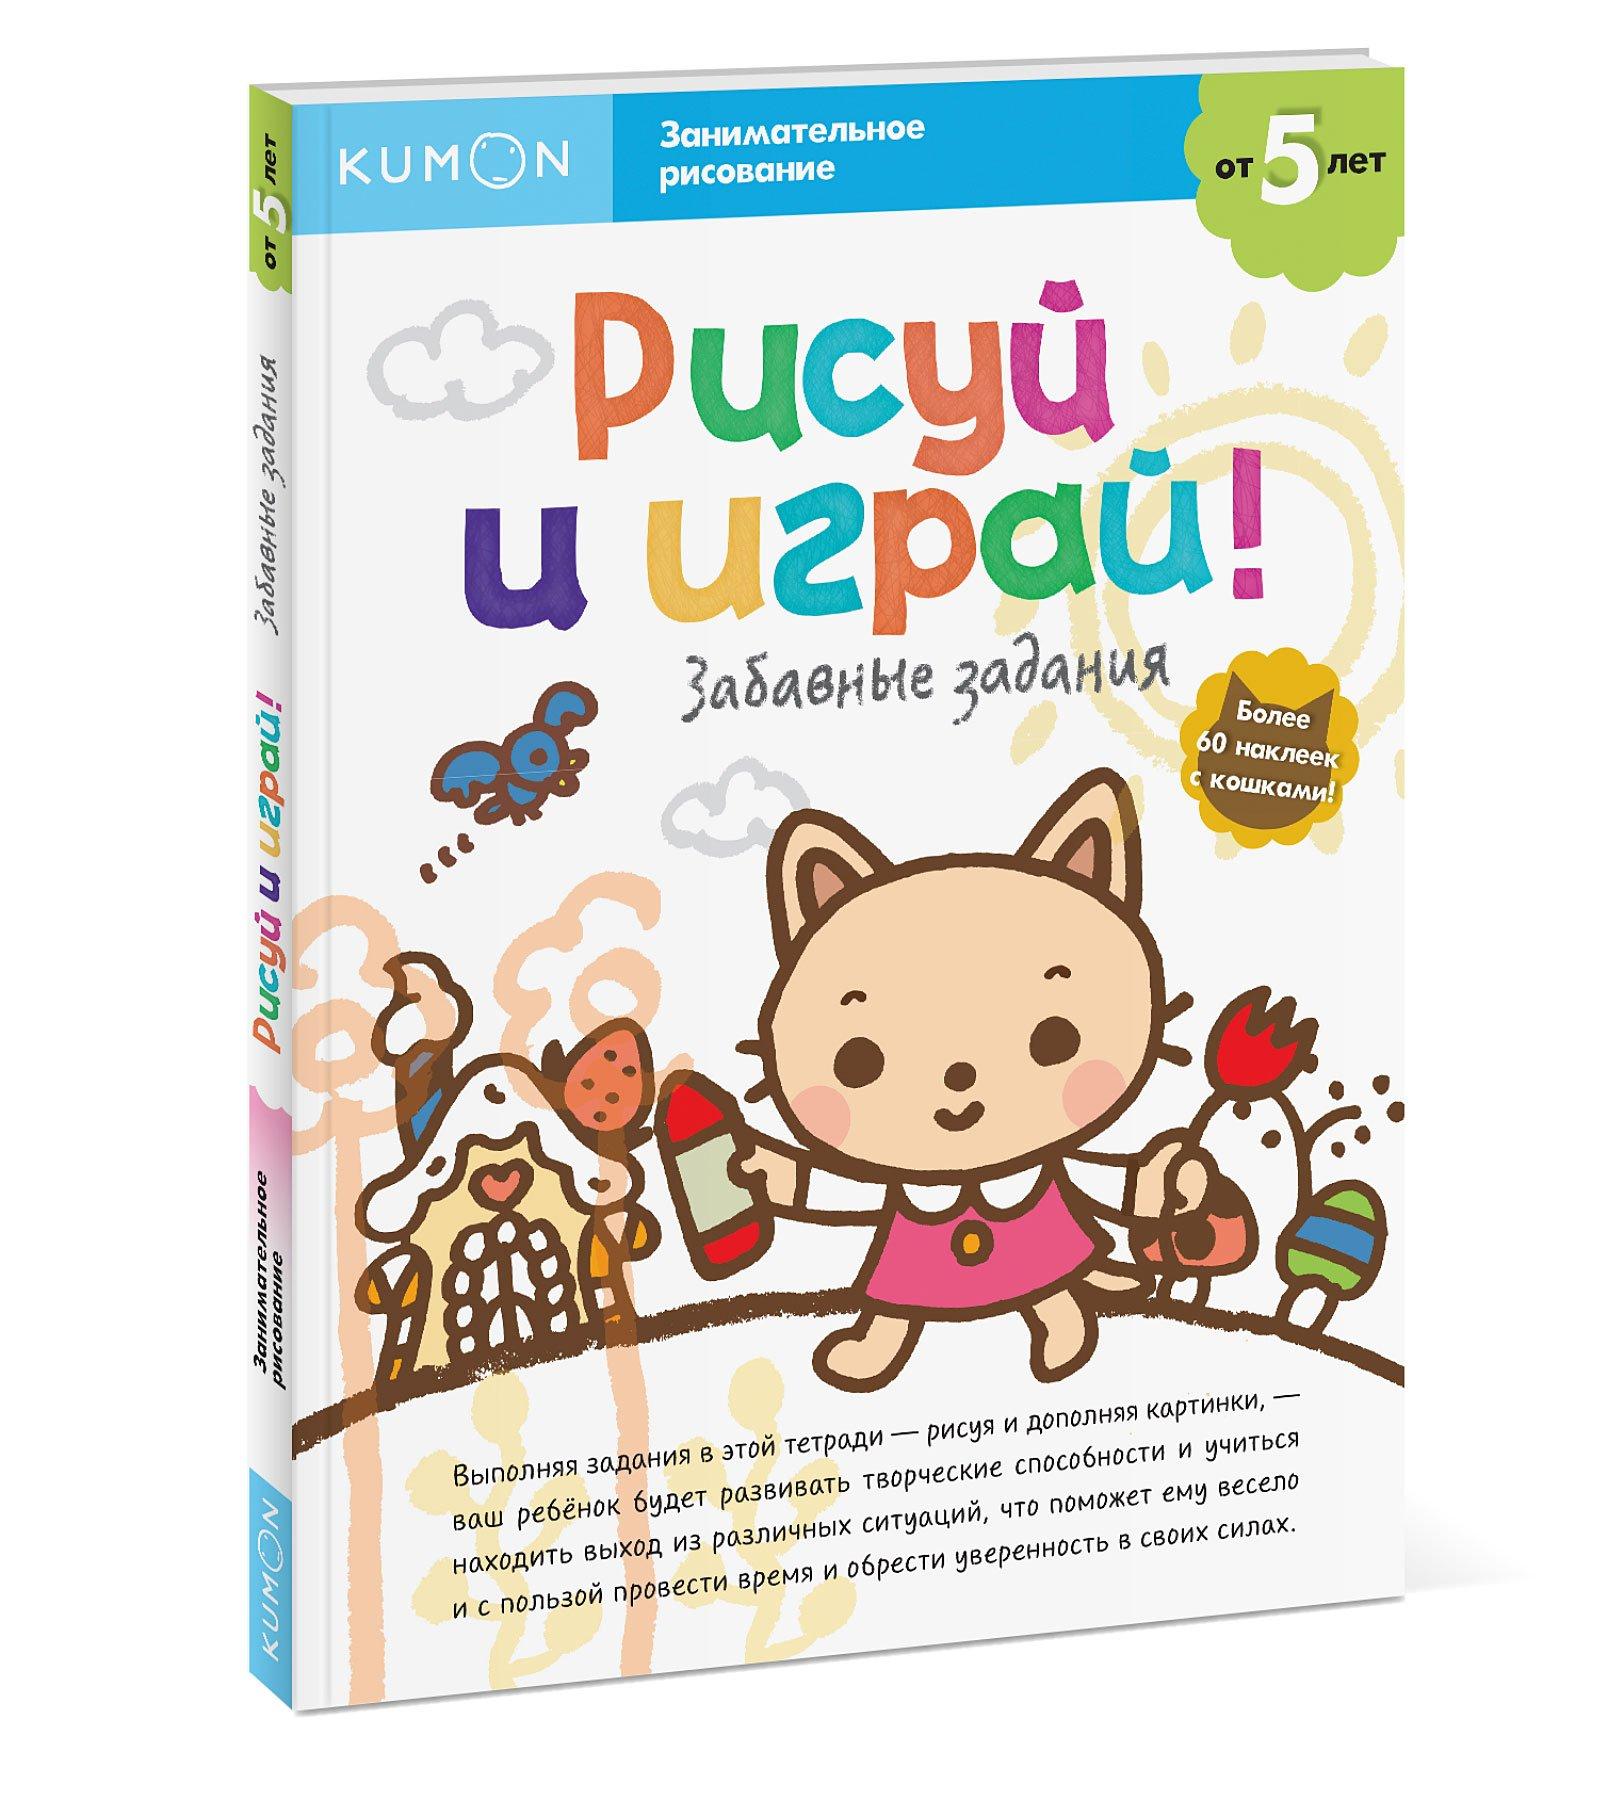 KUMON Рисуй и играй! Забавные задания kumon рисуй и играй забавные задания